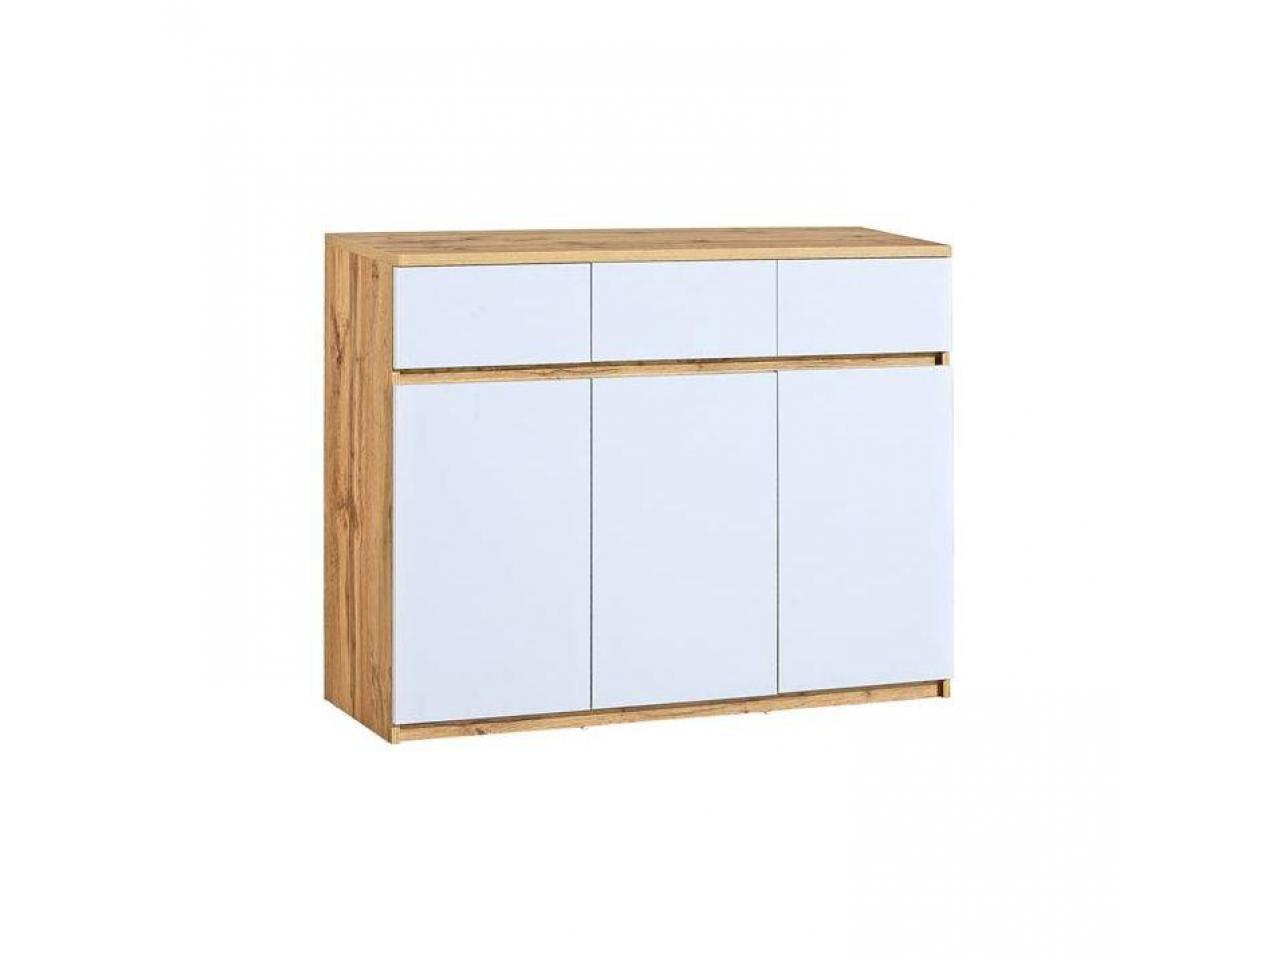 Furnipol -шкафы и комоды - 3